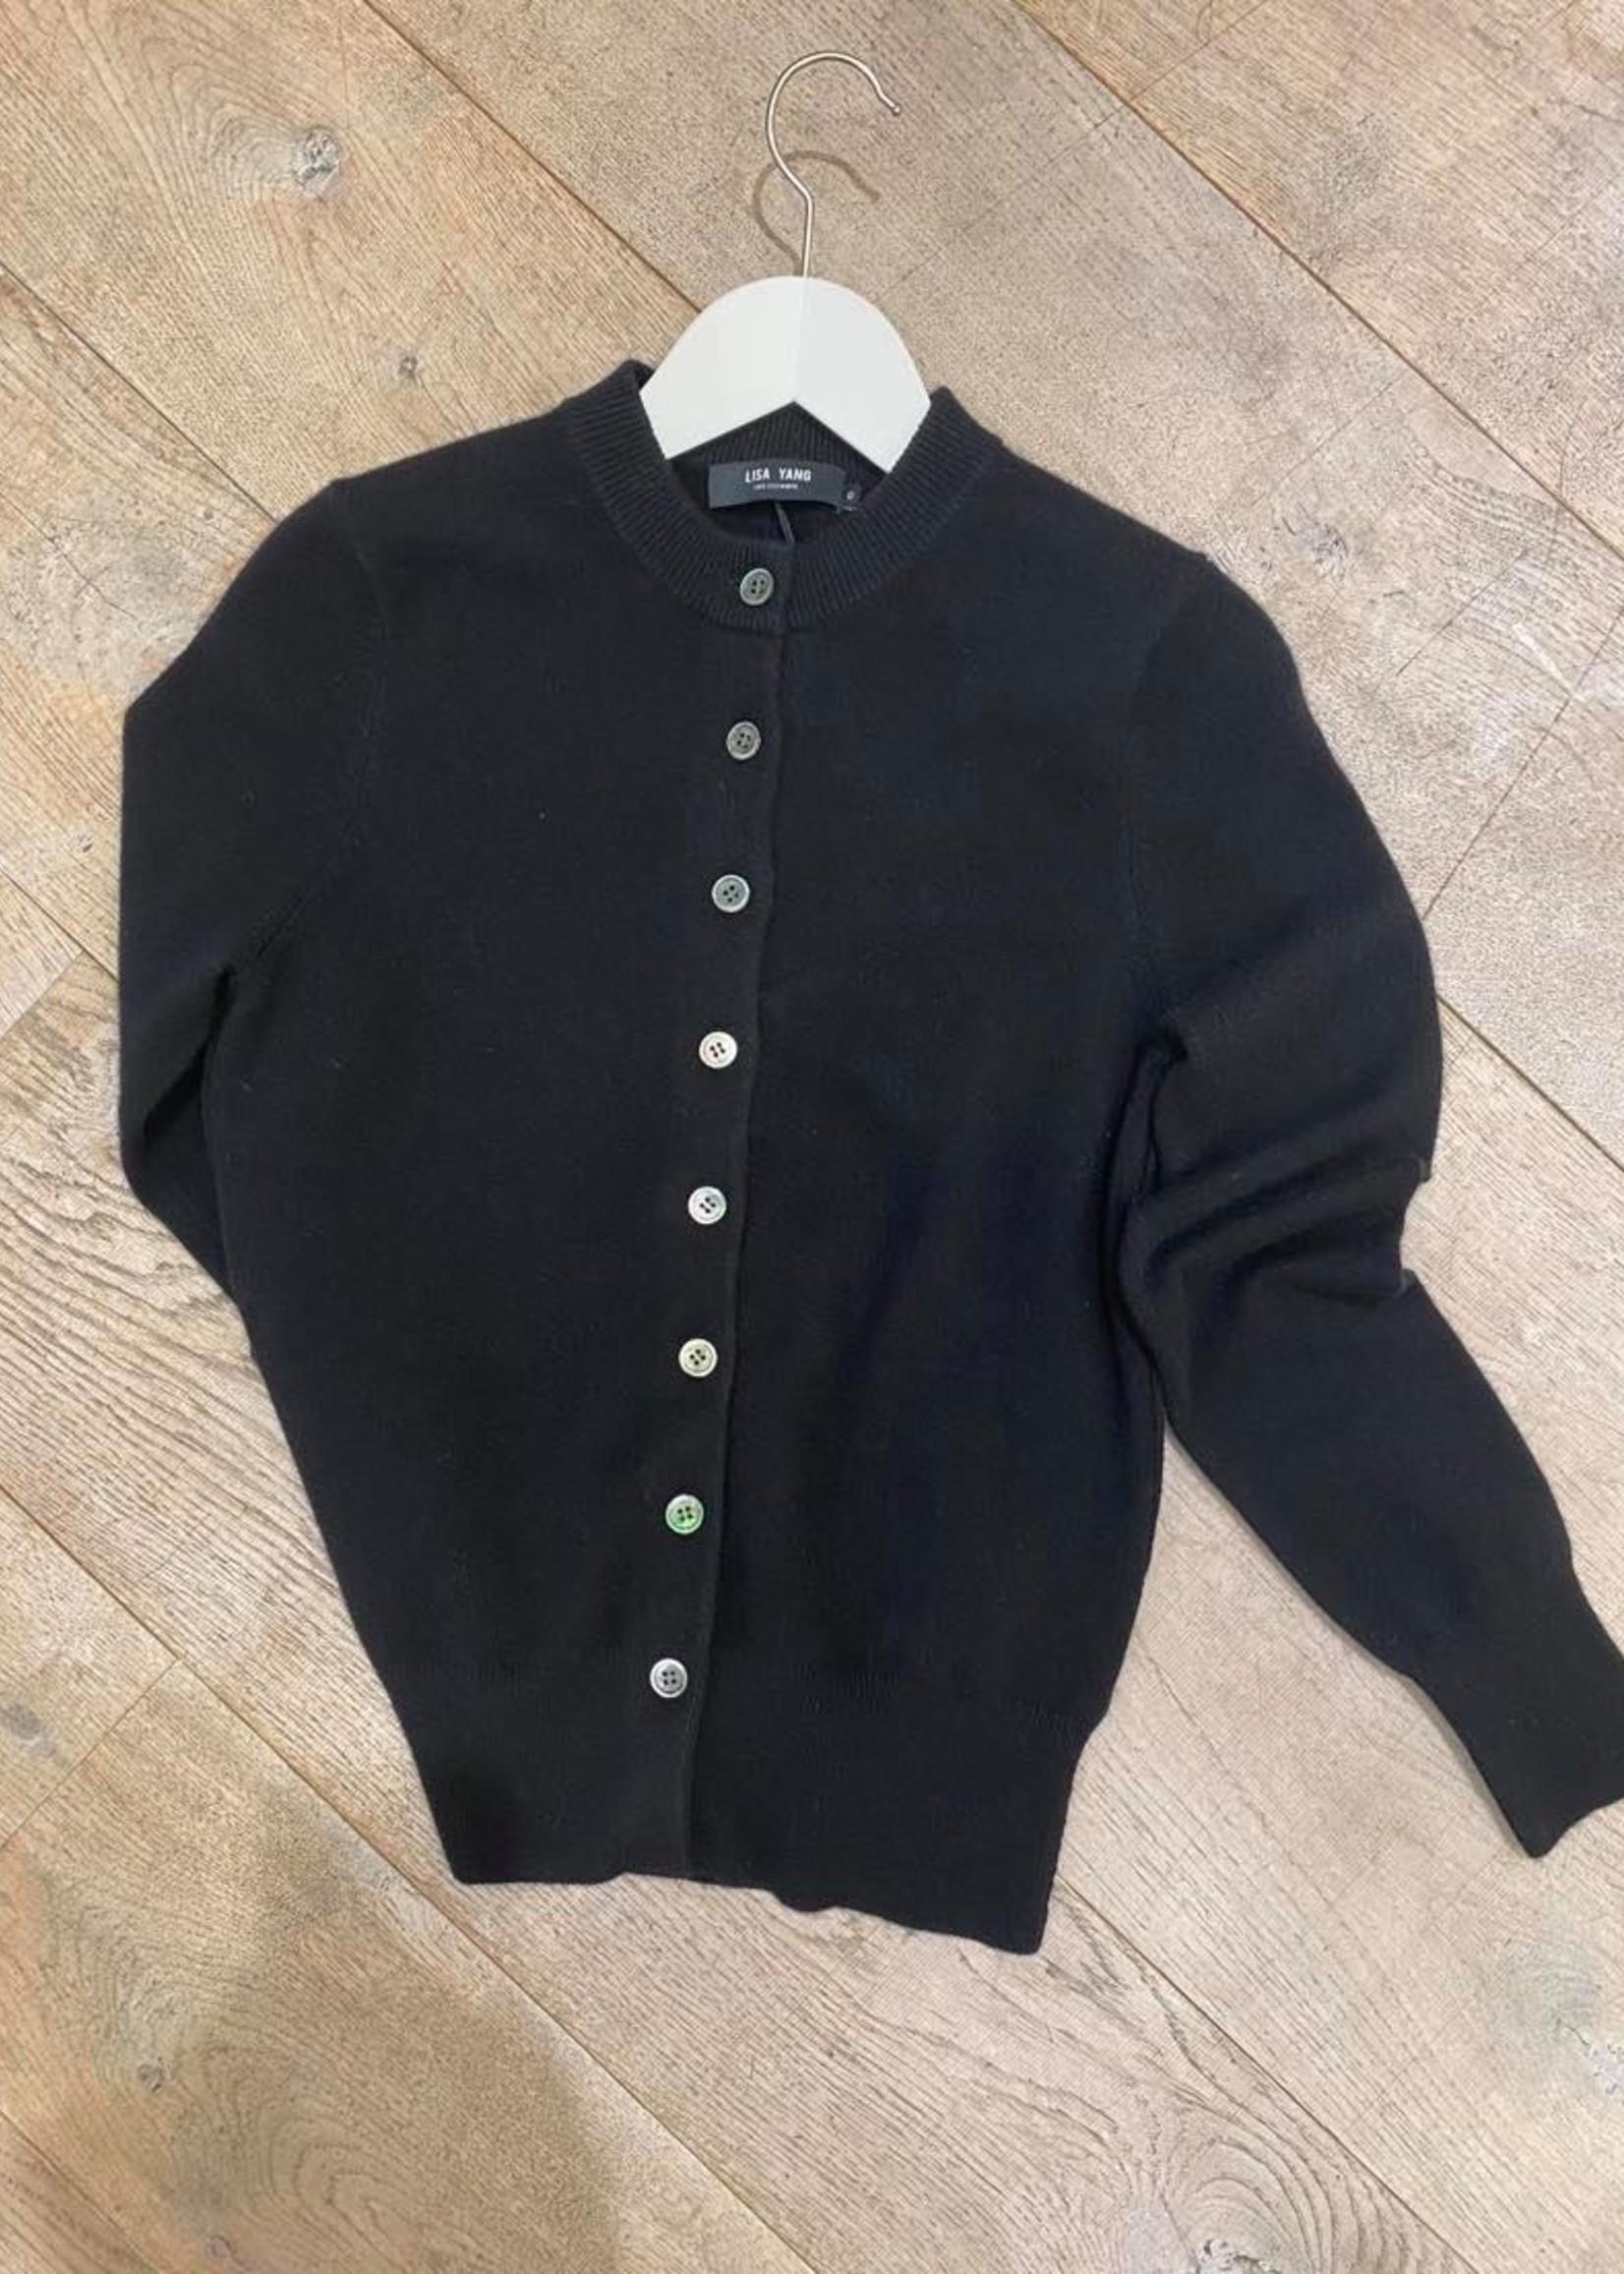 lisa yang lisa yang cashmere blacke cardigan black  size 0